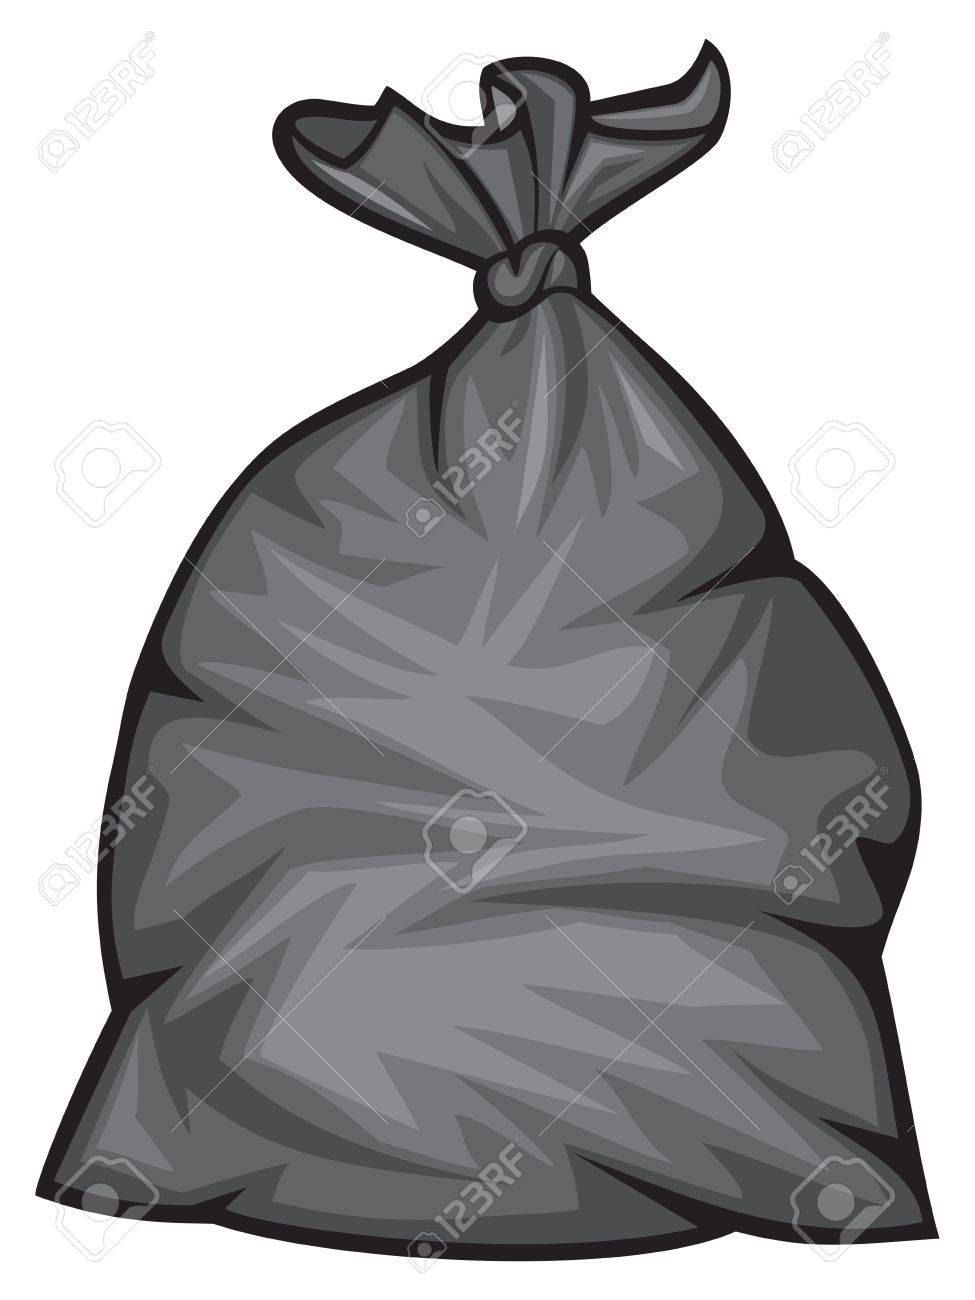 black plastic trash bag vector illustration - 66527294